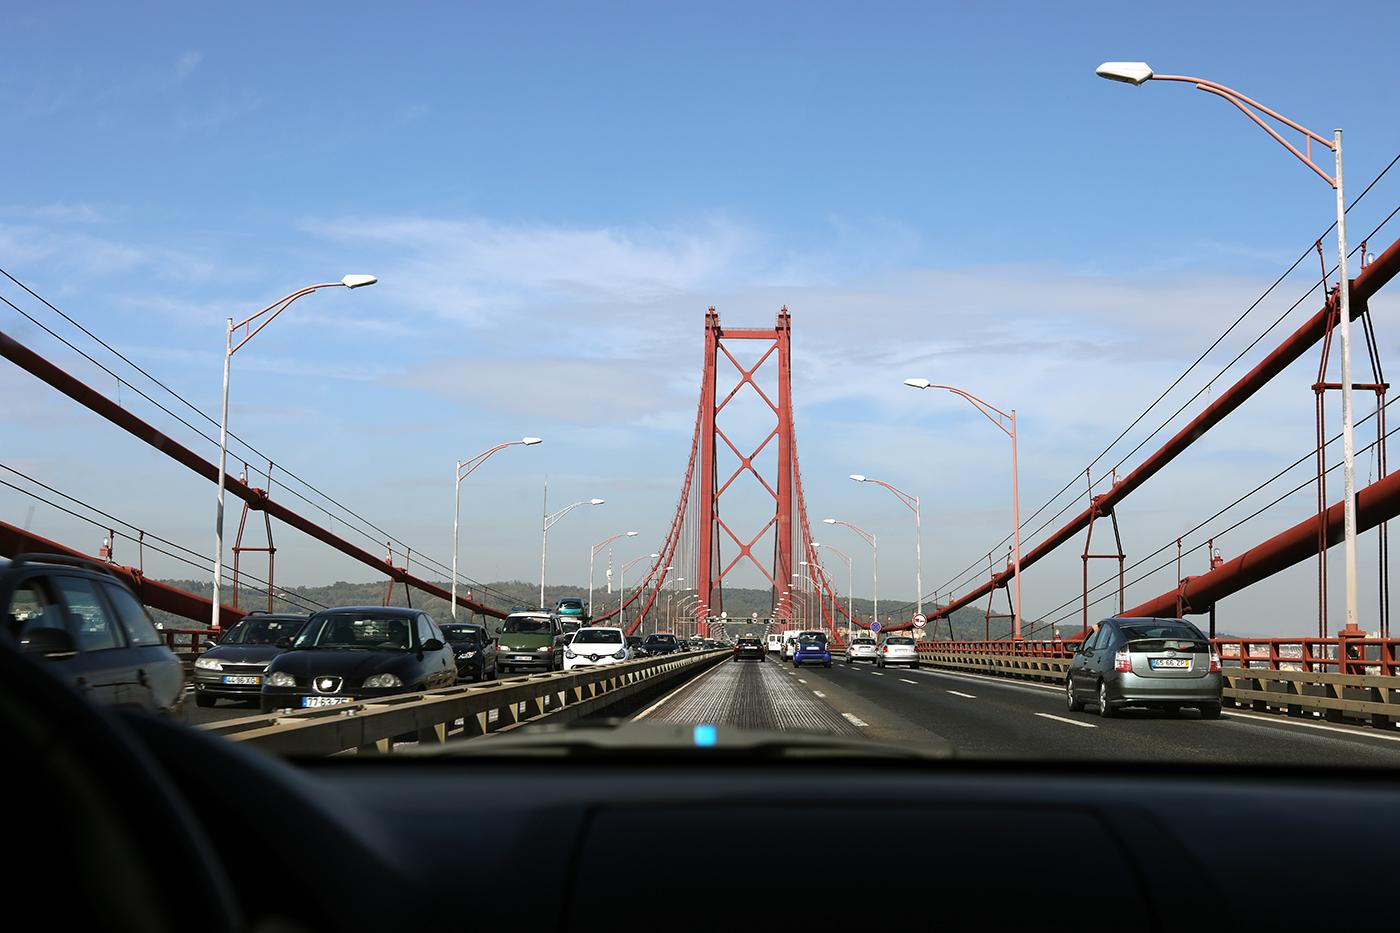 ponte25abril_pn.jpg